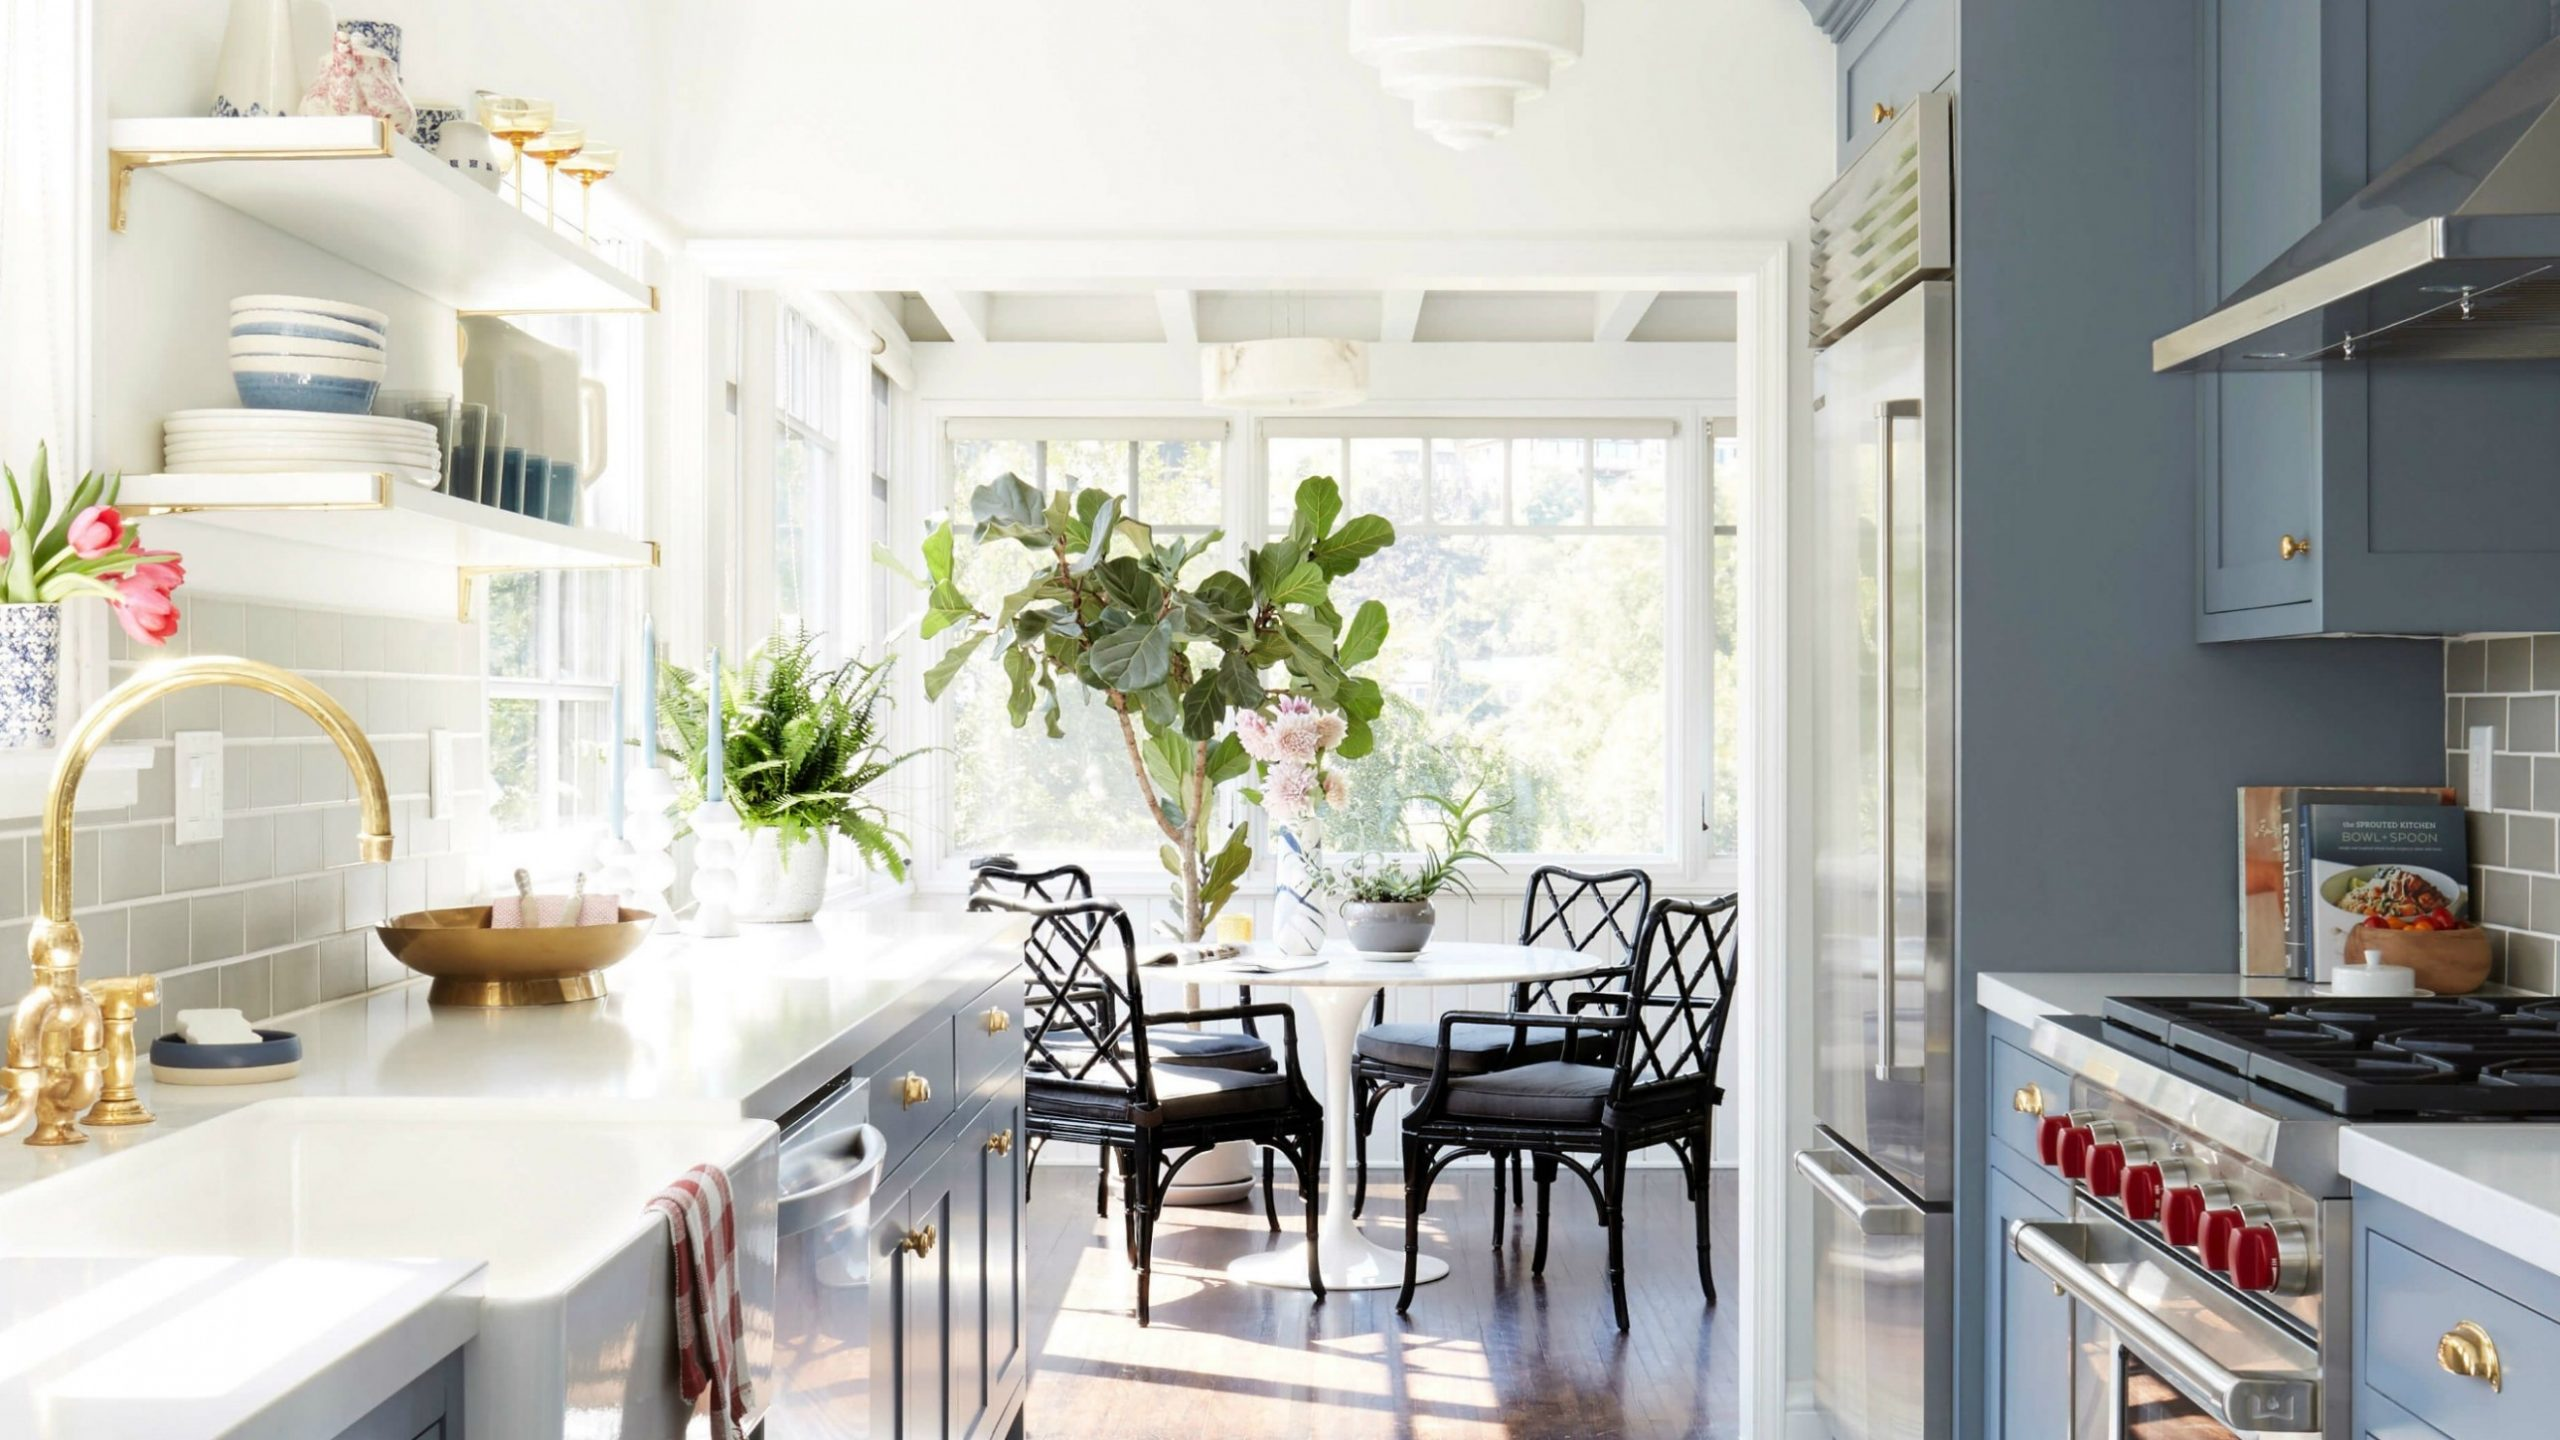 Small Galley Kitchen Ideas & Design Inspiration  Architectural Digest - Dining Room Off Kitchen Ideas